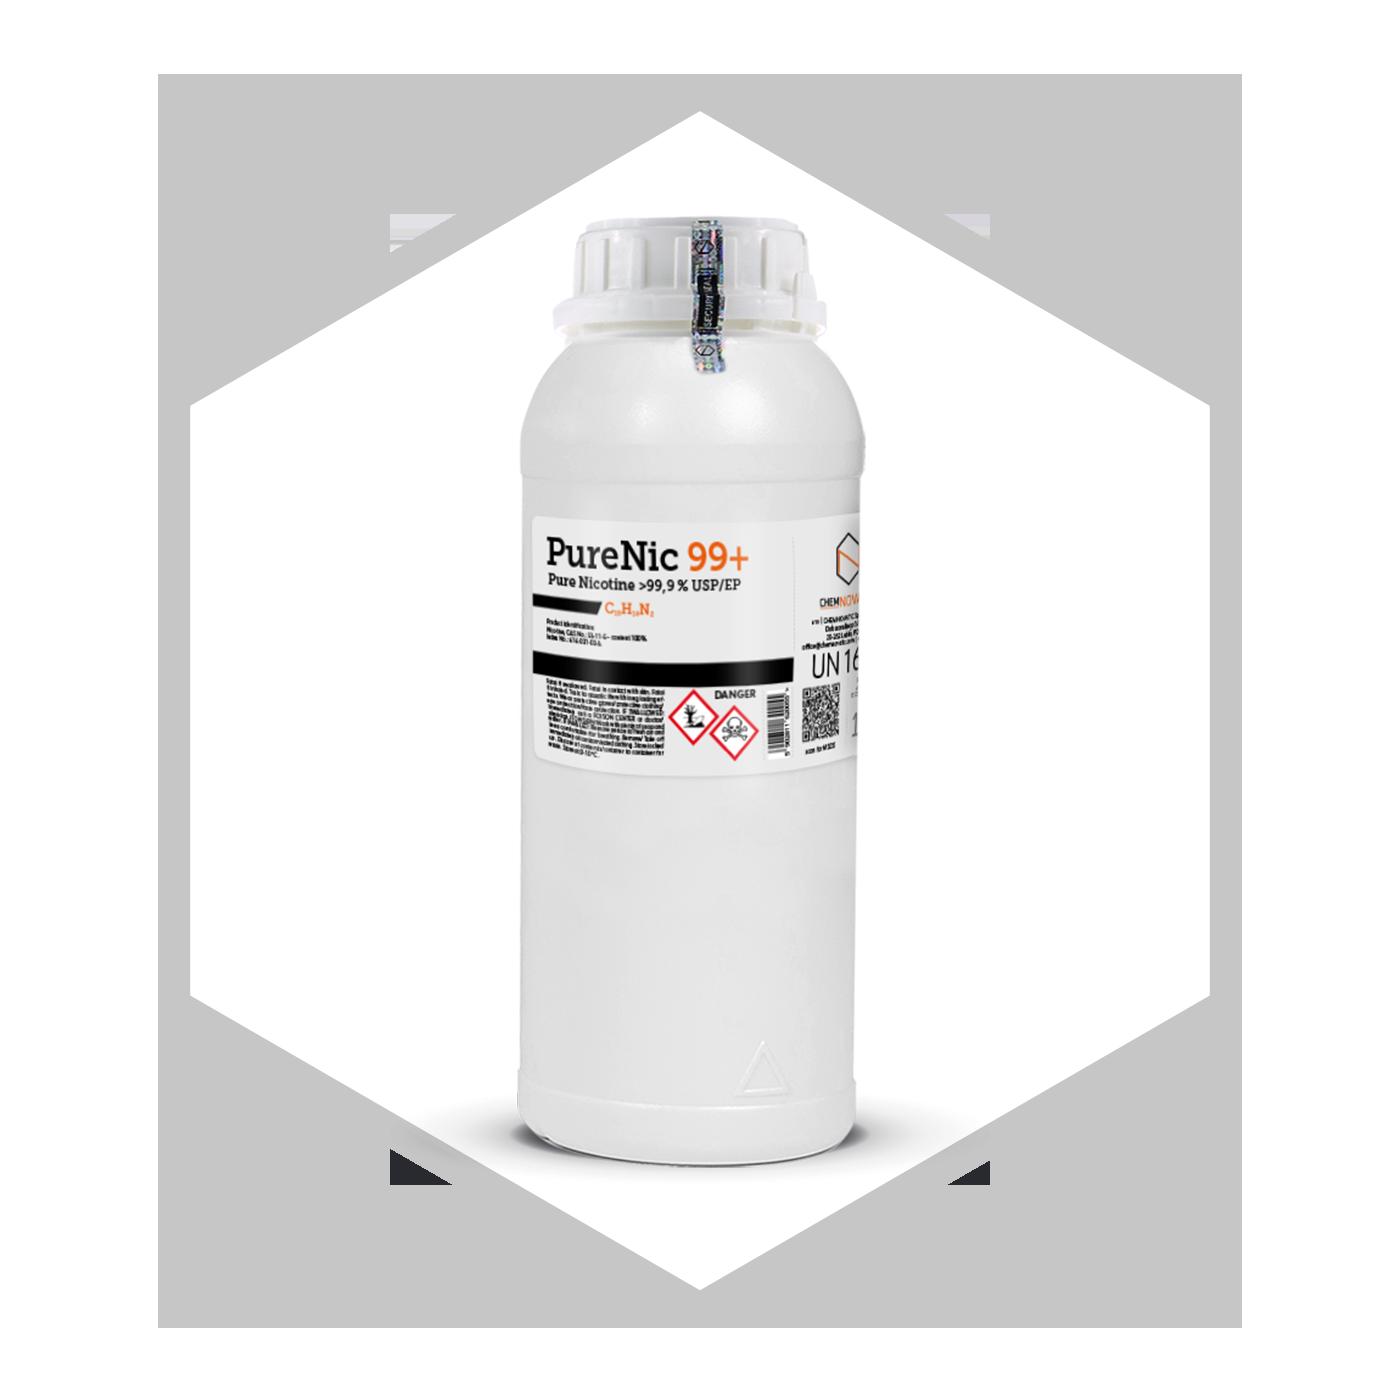 Pure Nicotine 99,9% (USP/EP): PureNic 99+